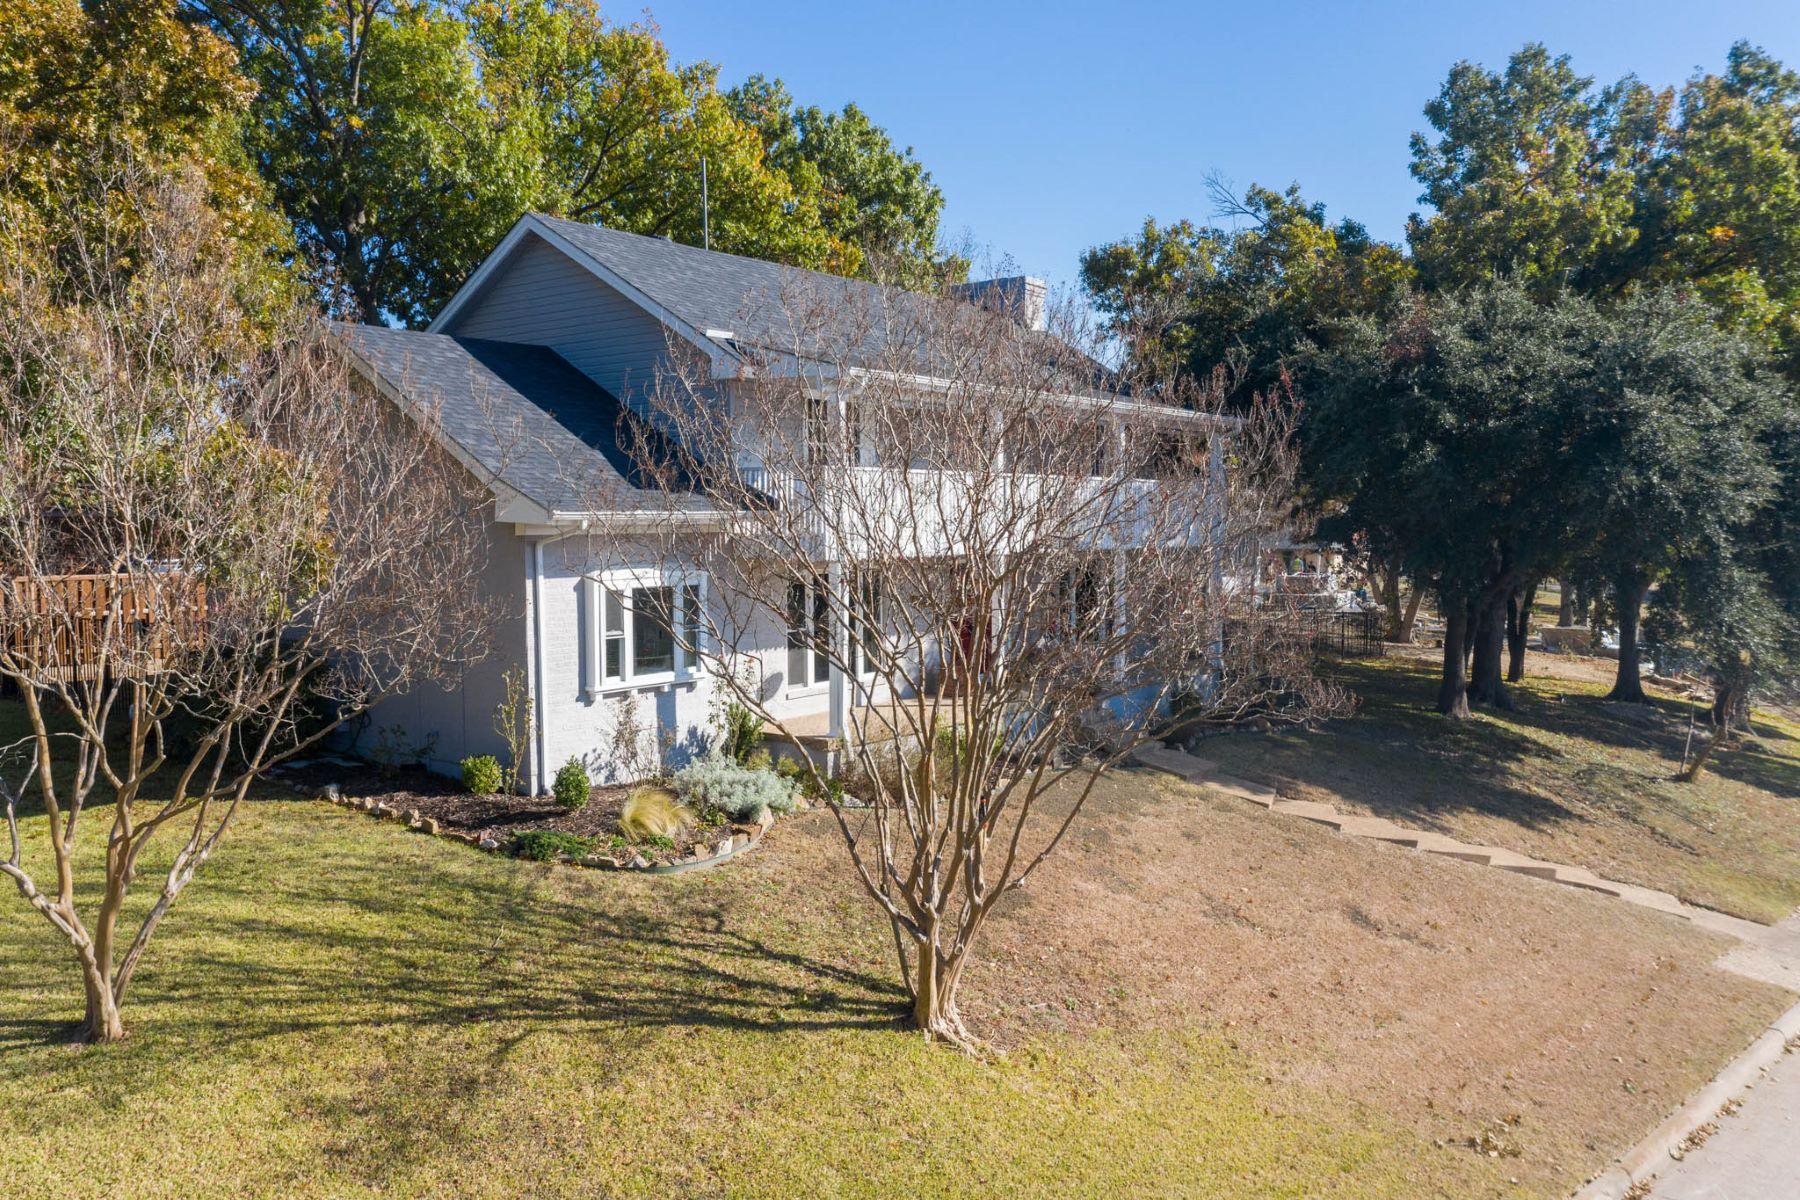 Single Family Homes für Verkauf beim COME CHECK OUT THIS VIEW! 113 Summit Ridge Drive, Rockwall, Texas 75087 Vereinigte Staaten